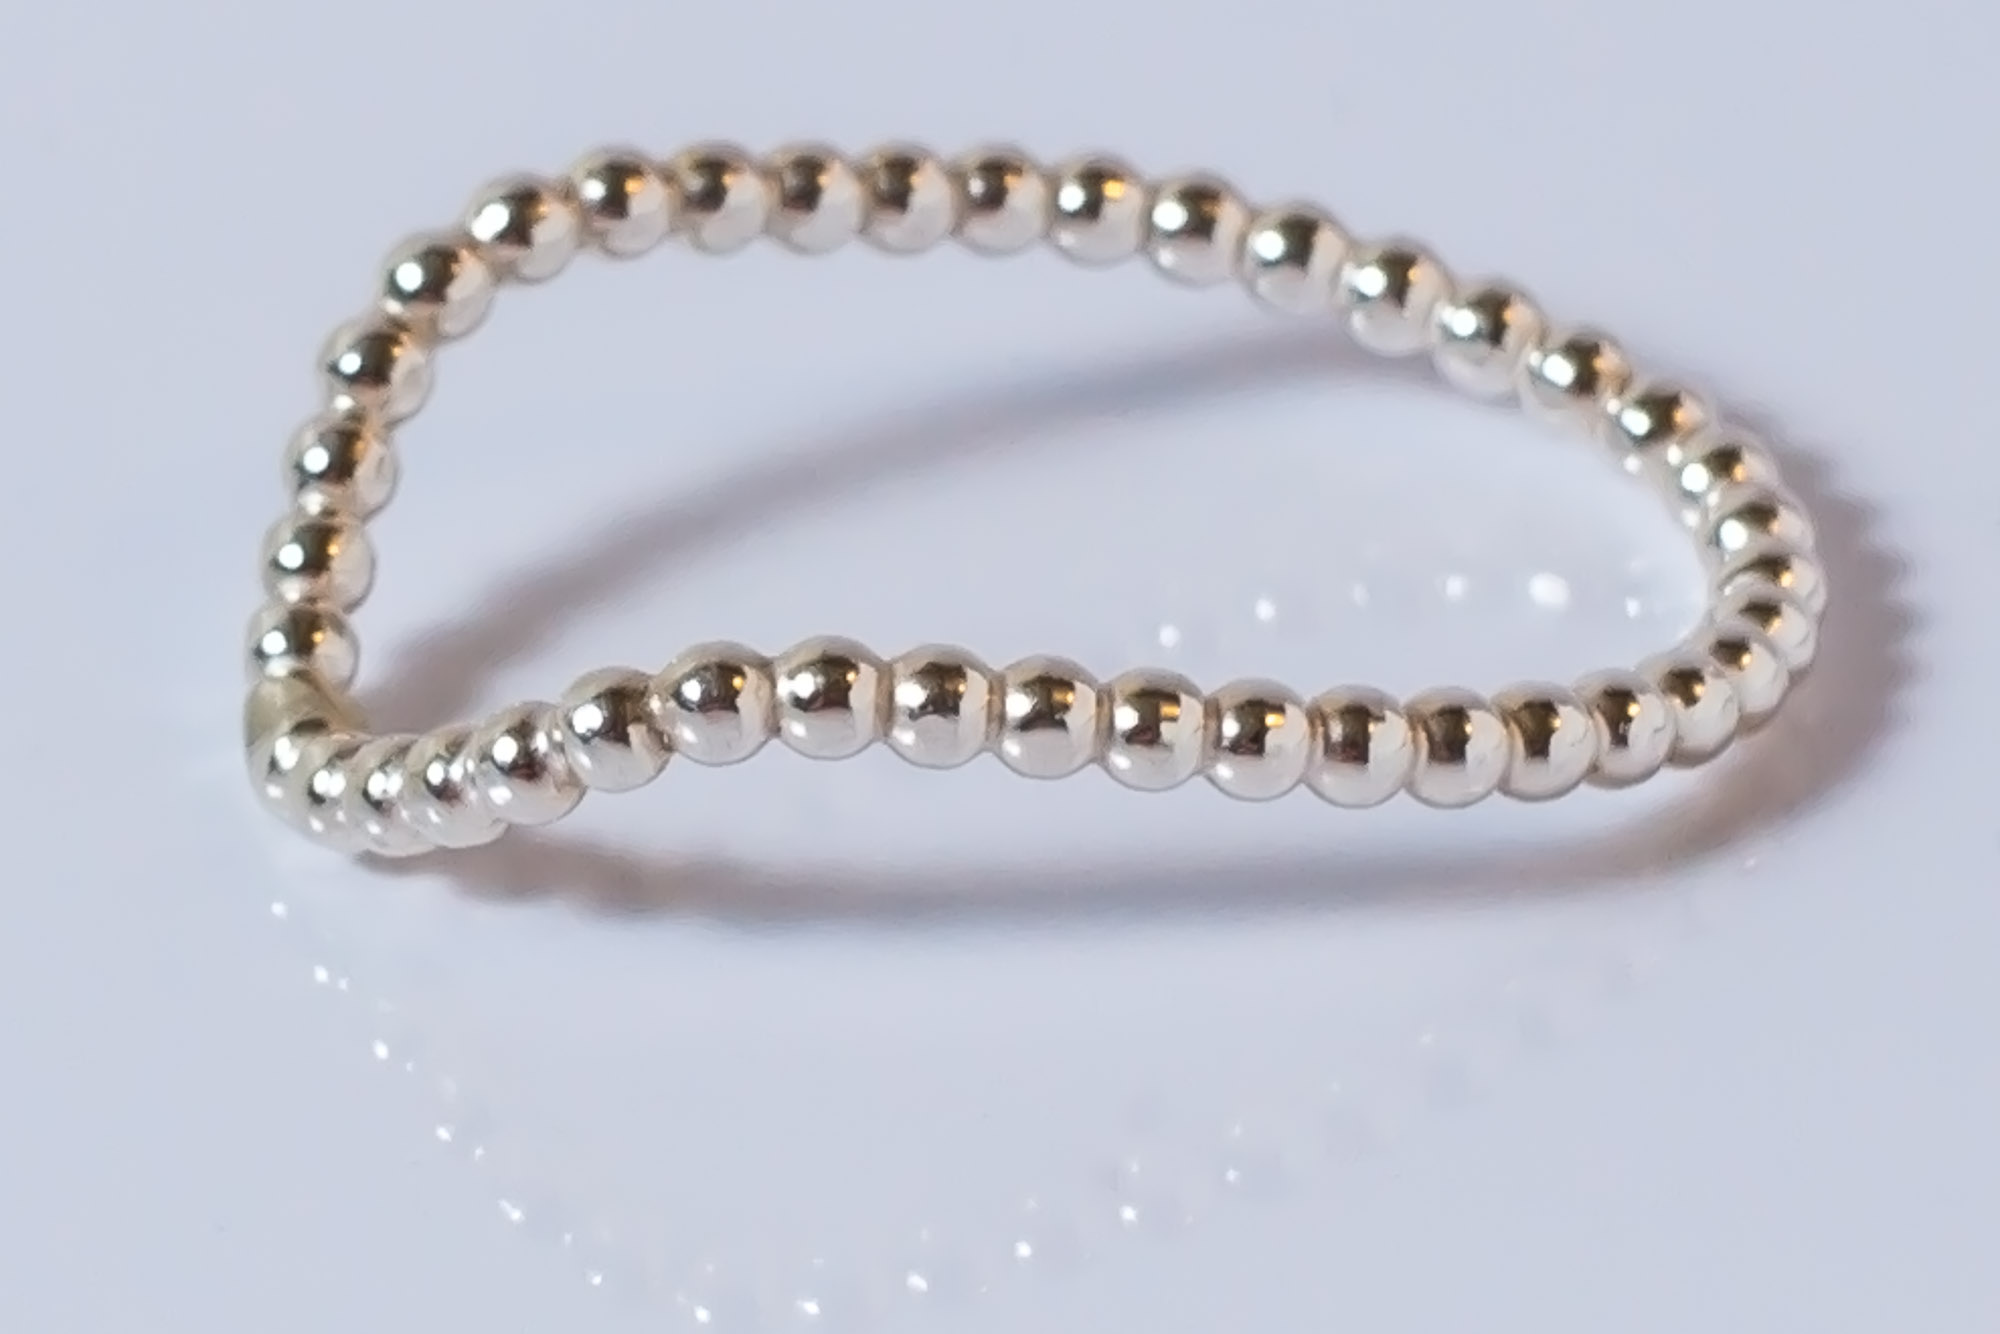 Pris dkk 650. Perletråd med knæk